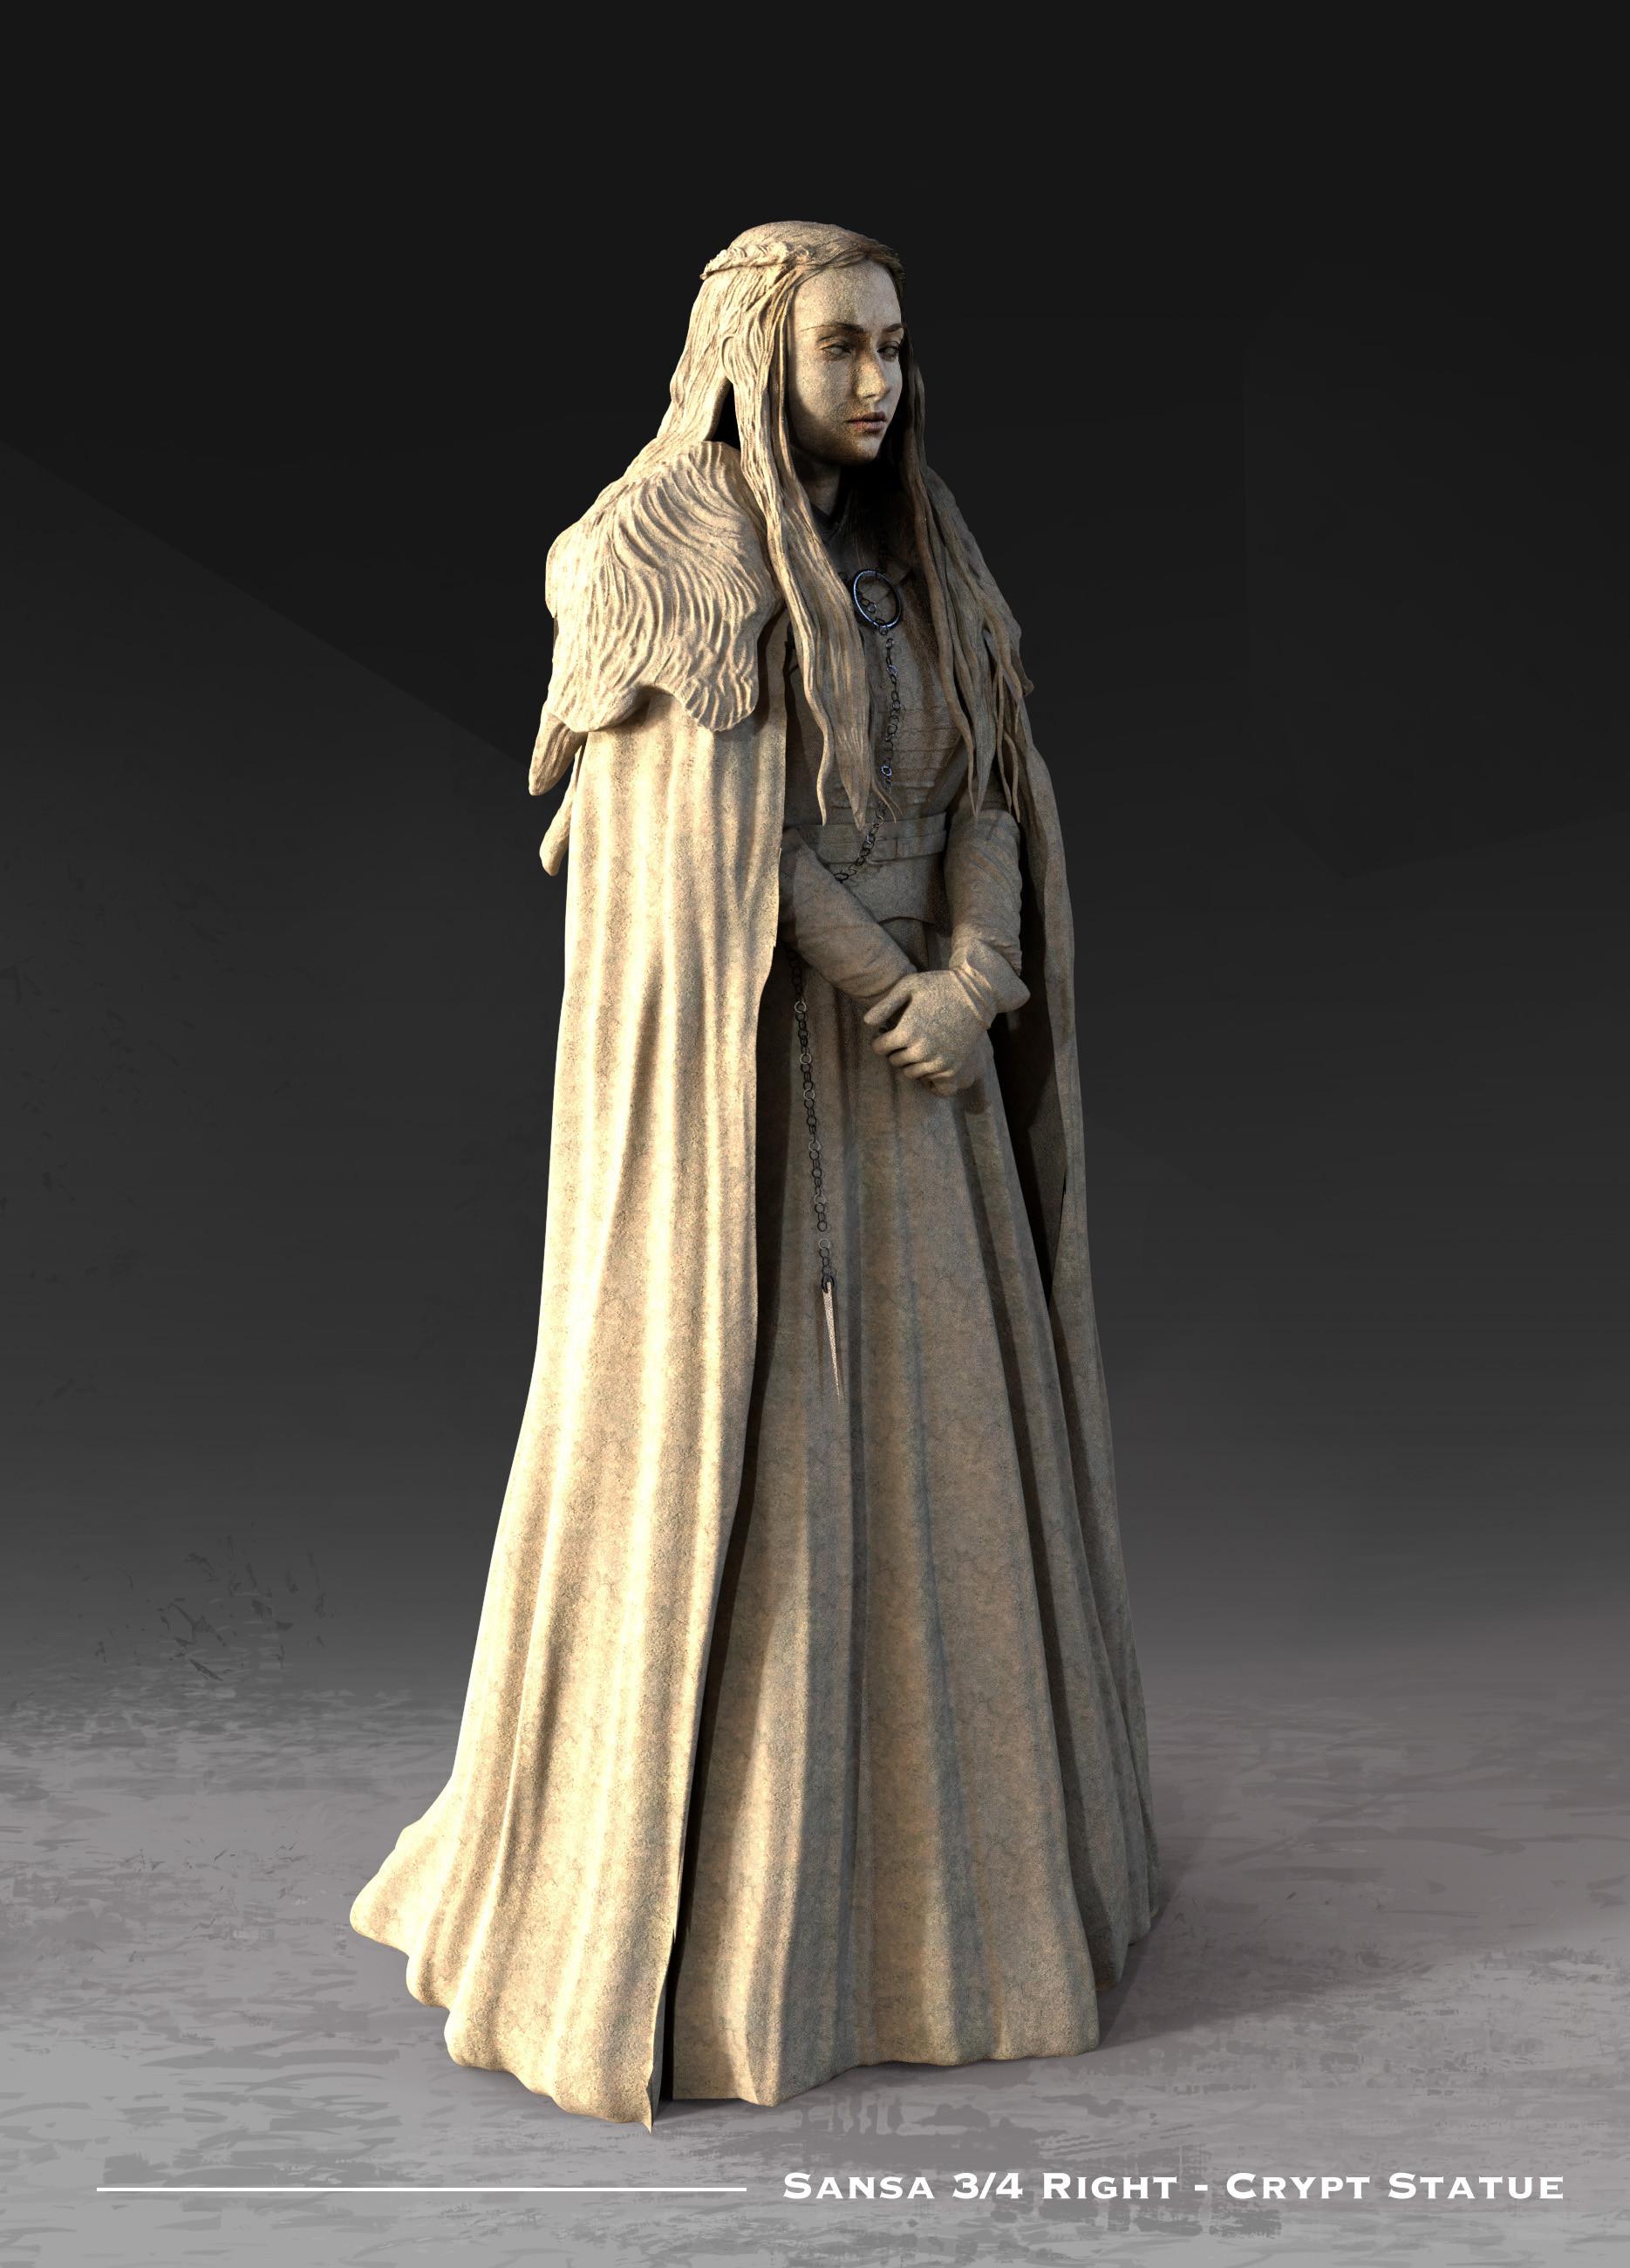 Kieran belshaw sansa statue 3quarterright v001